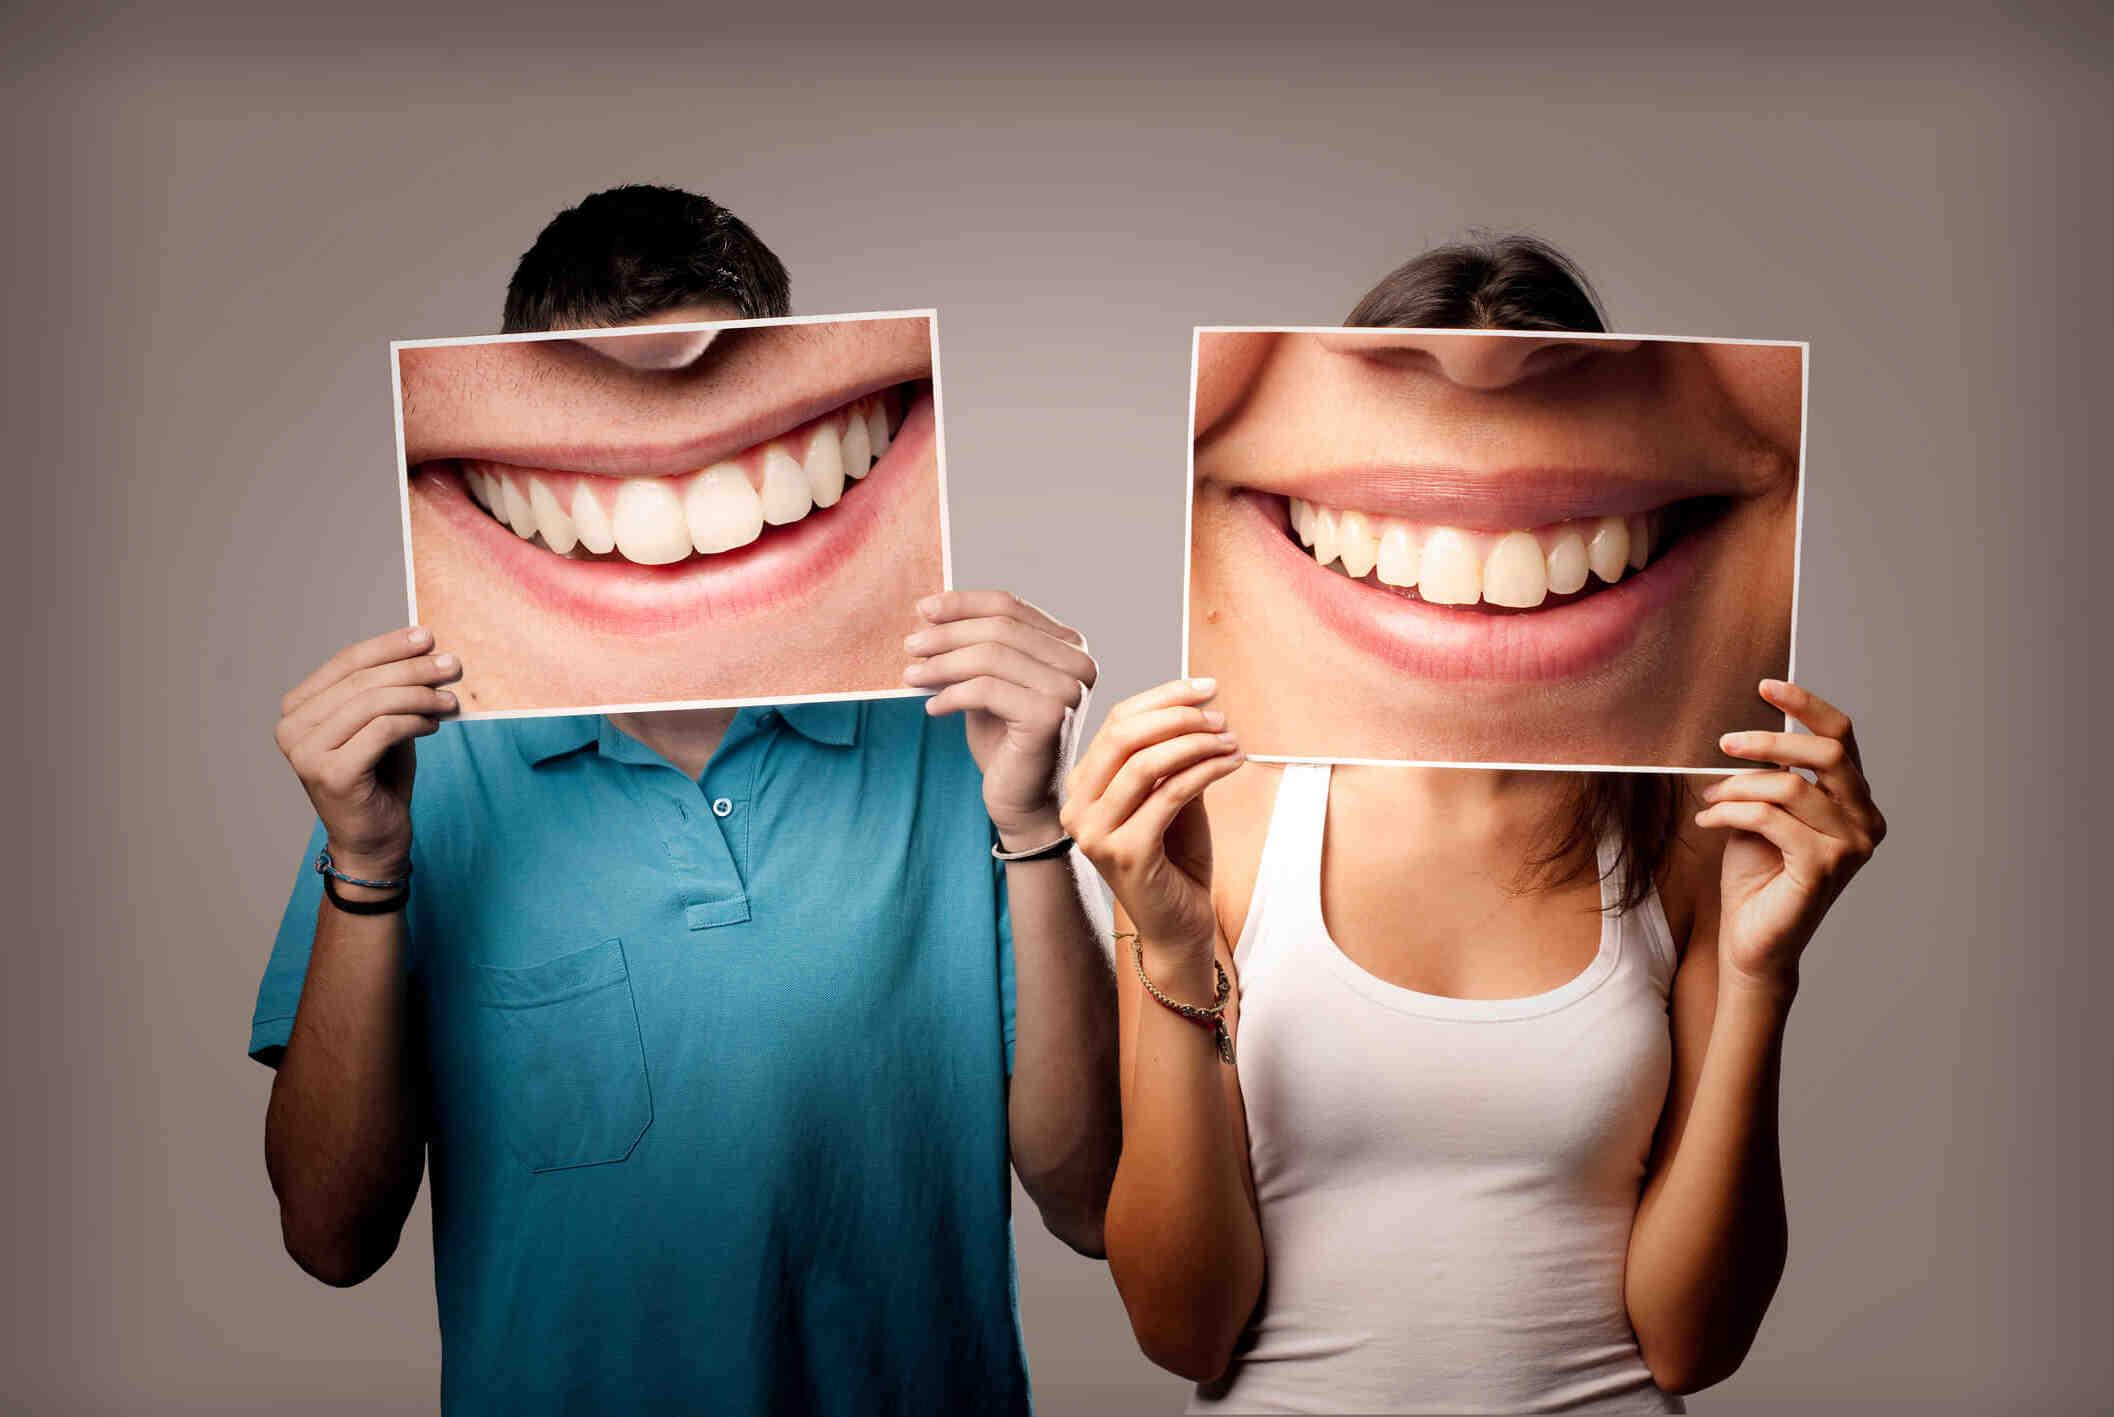 Quel est l'organe de la bouche ?